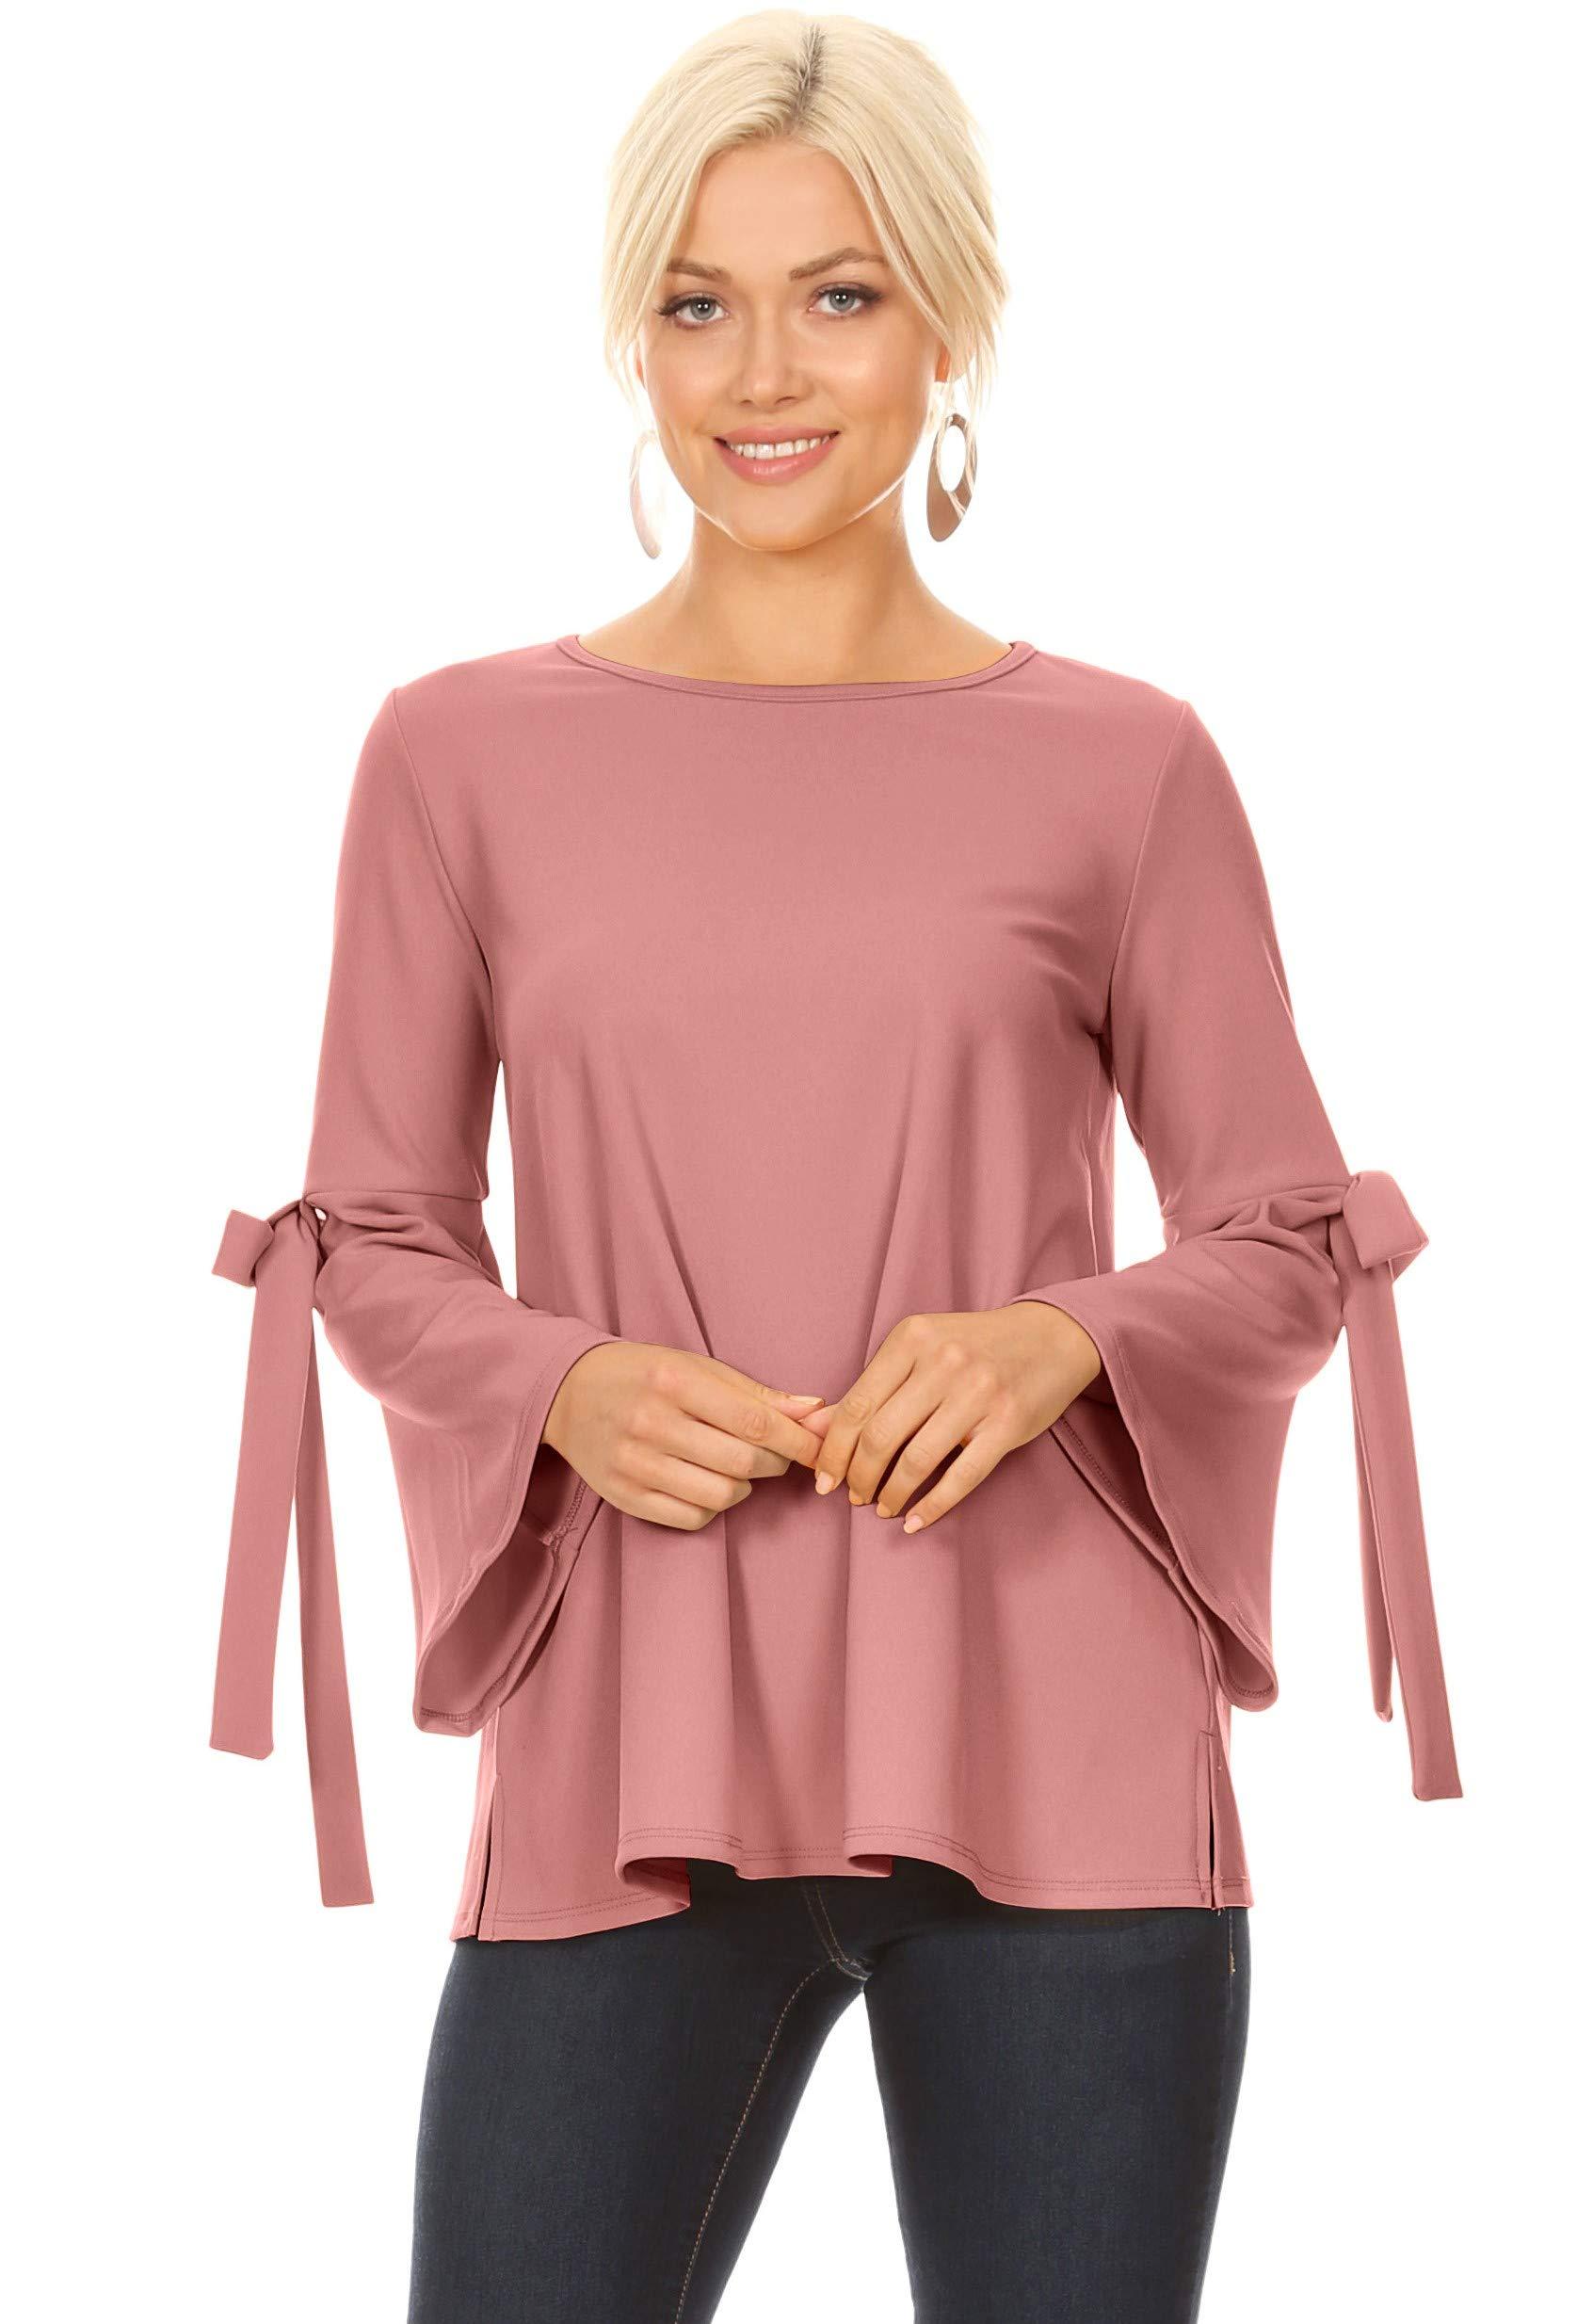 c8be06f75ad Ladies Plus Size Dressy Tops - Gomes Weine AG